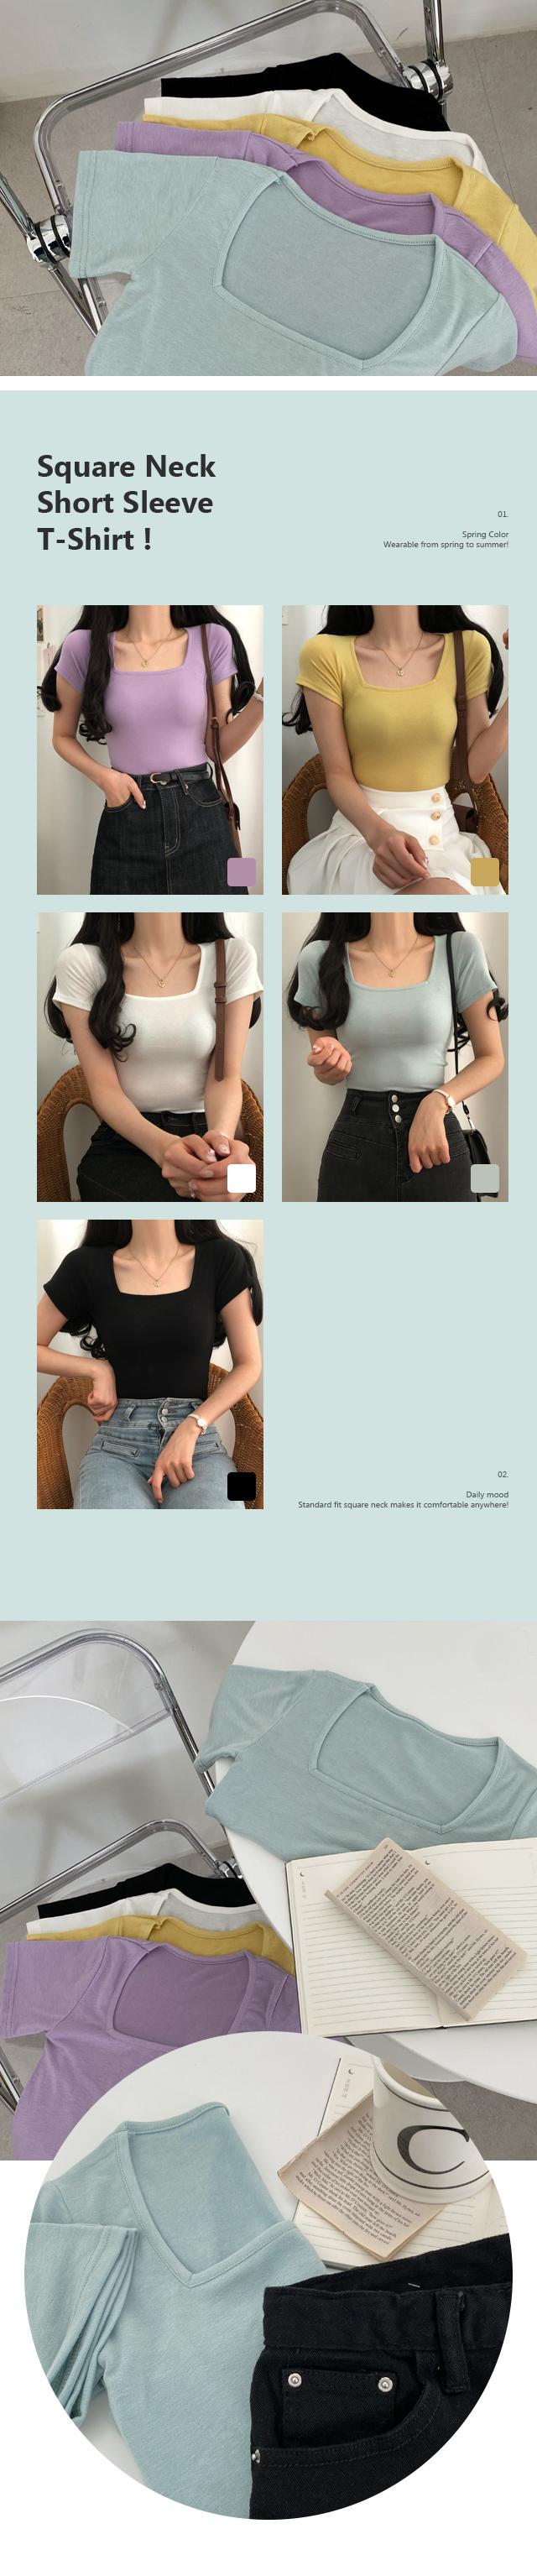 Square-neck short-sleeved T-shirt